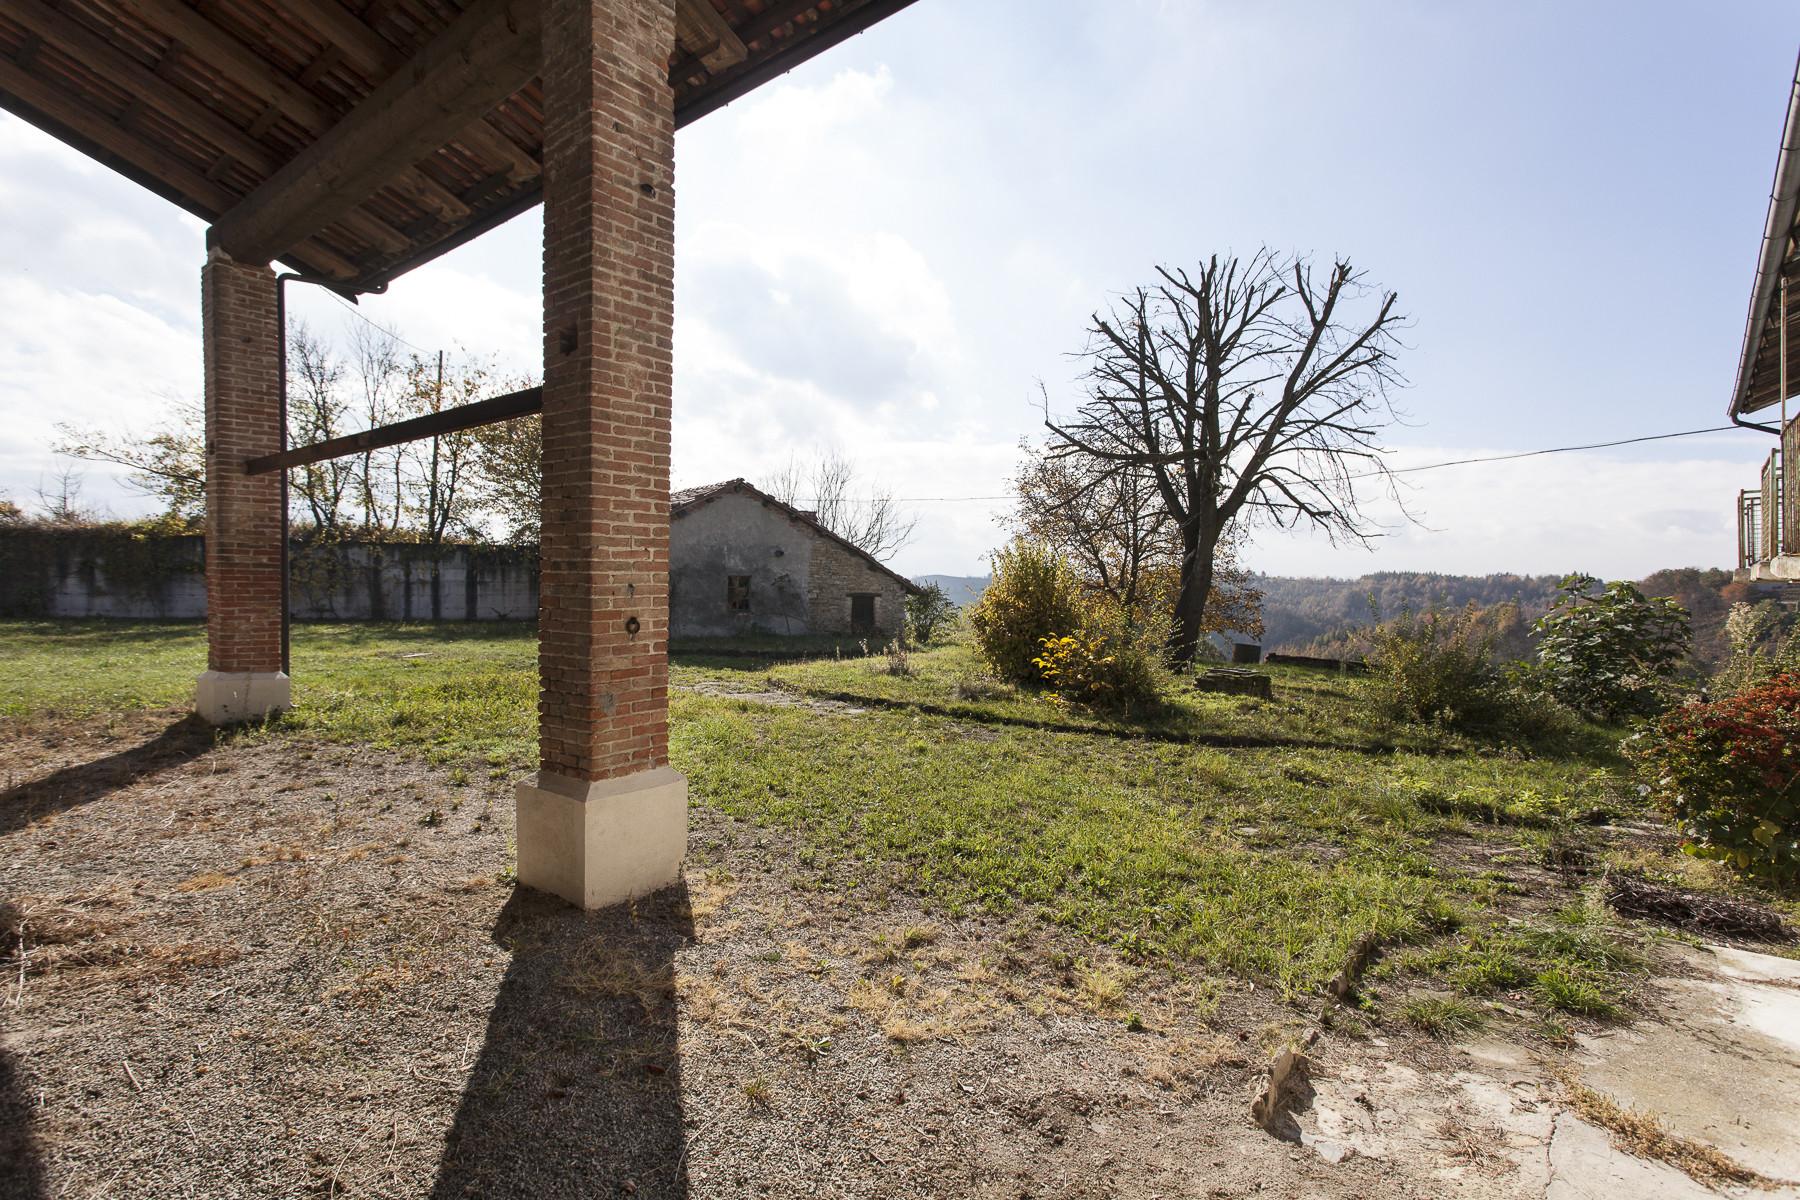 Villa in Vendita a Clavesana: 5 locali, 1130 mq - Foto 15